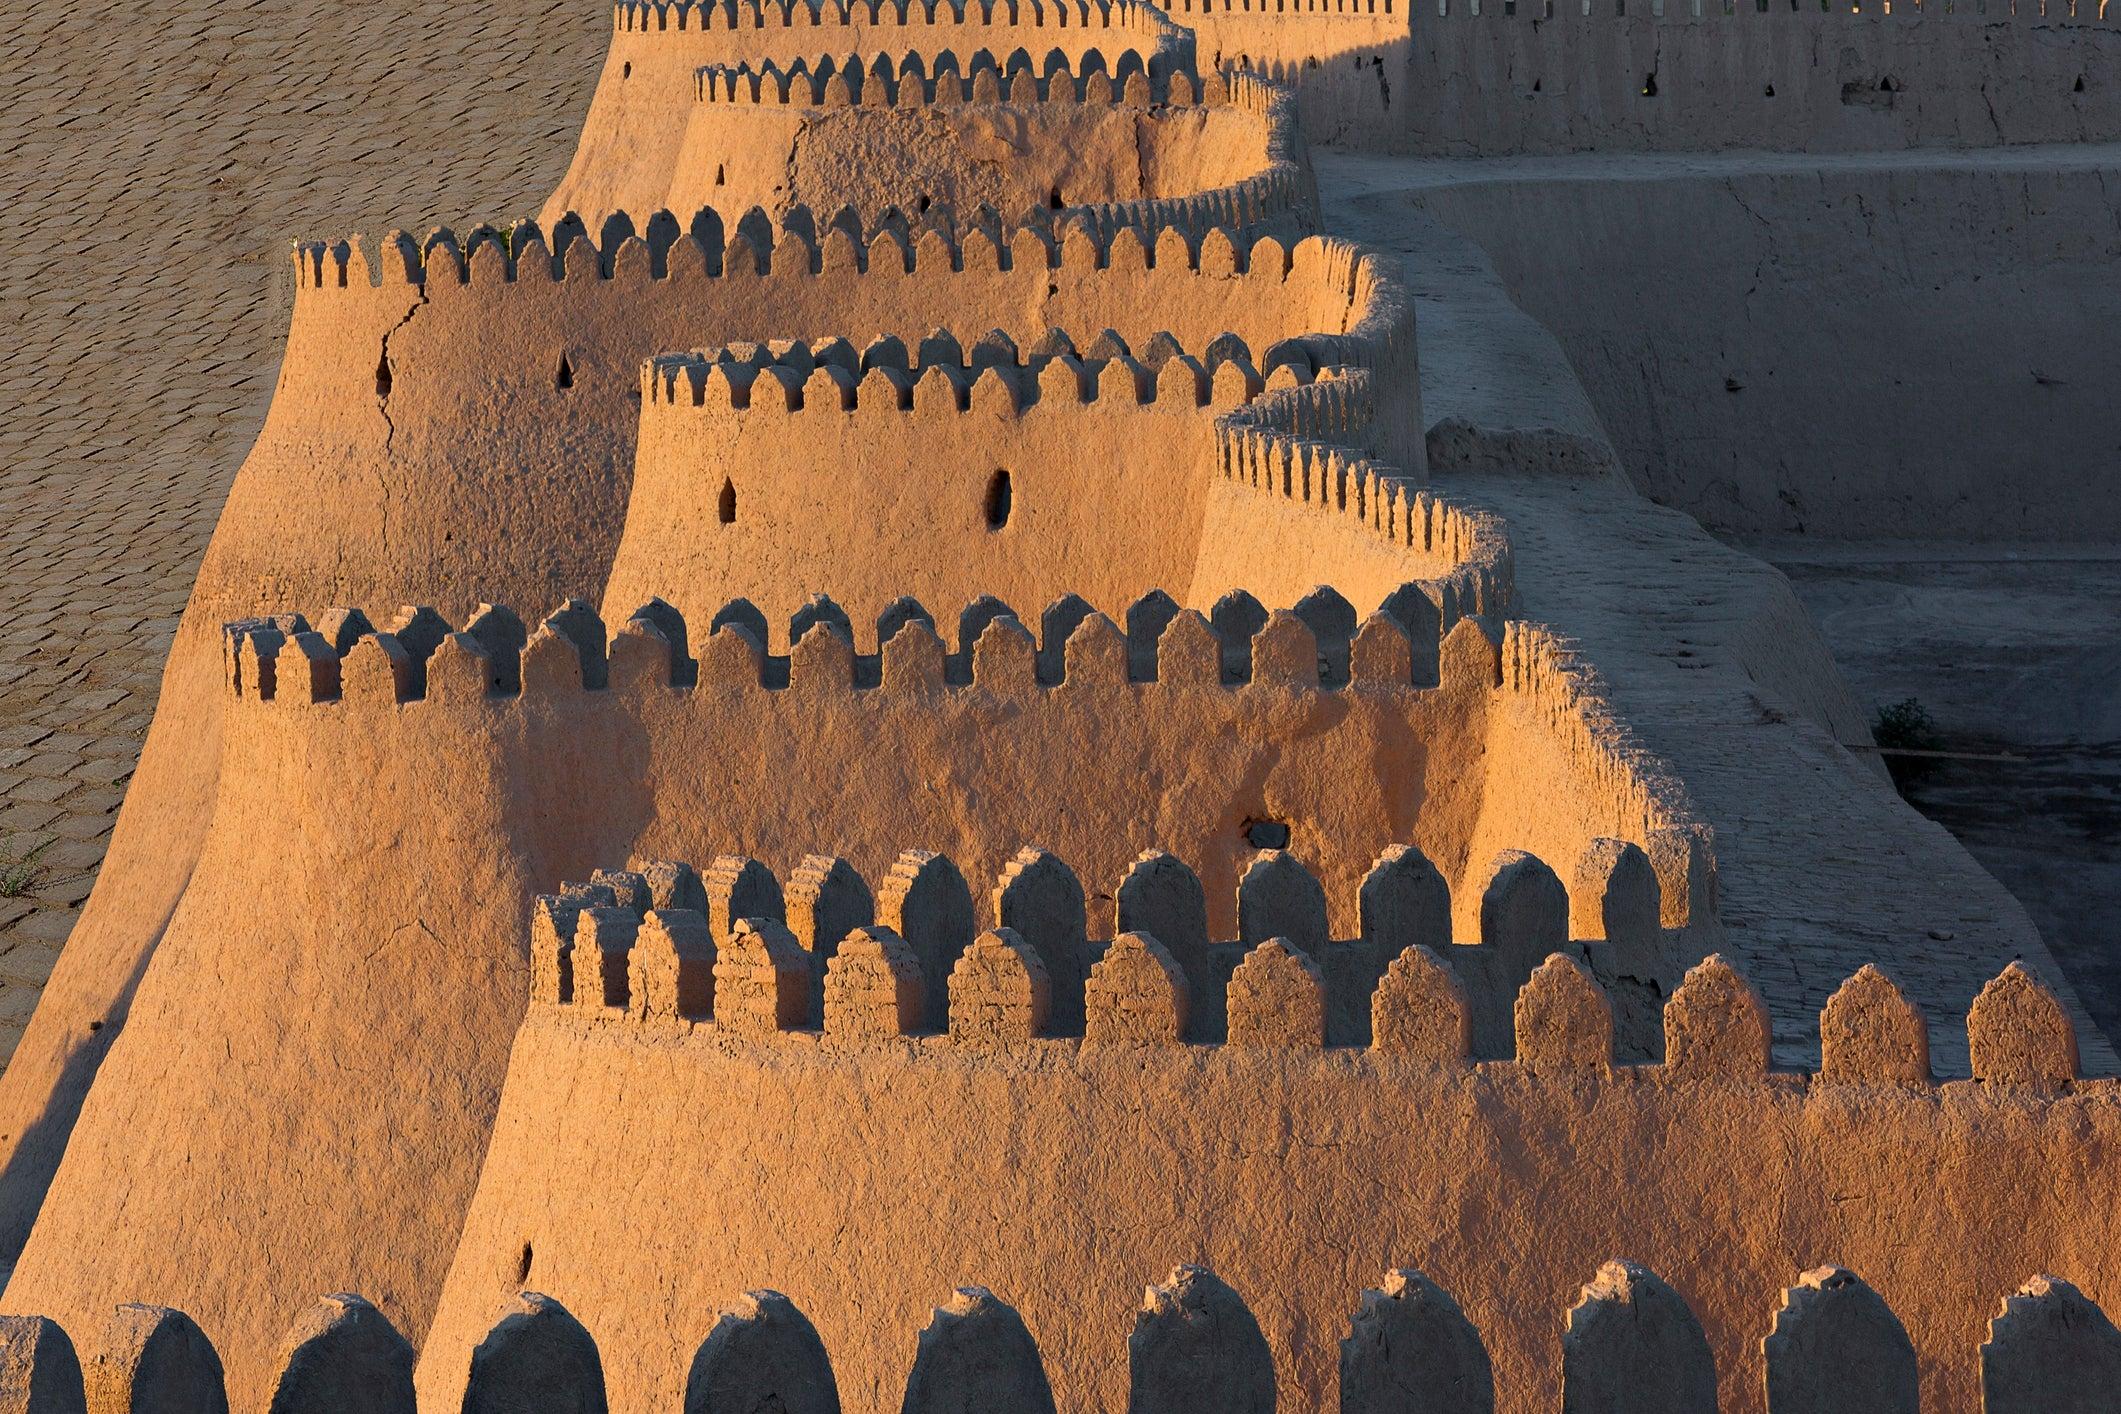 Uzbekistan: Visa-free travel and reopened borders along the Silk Road